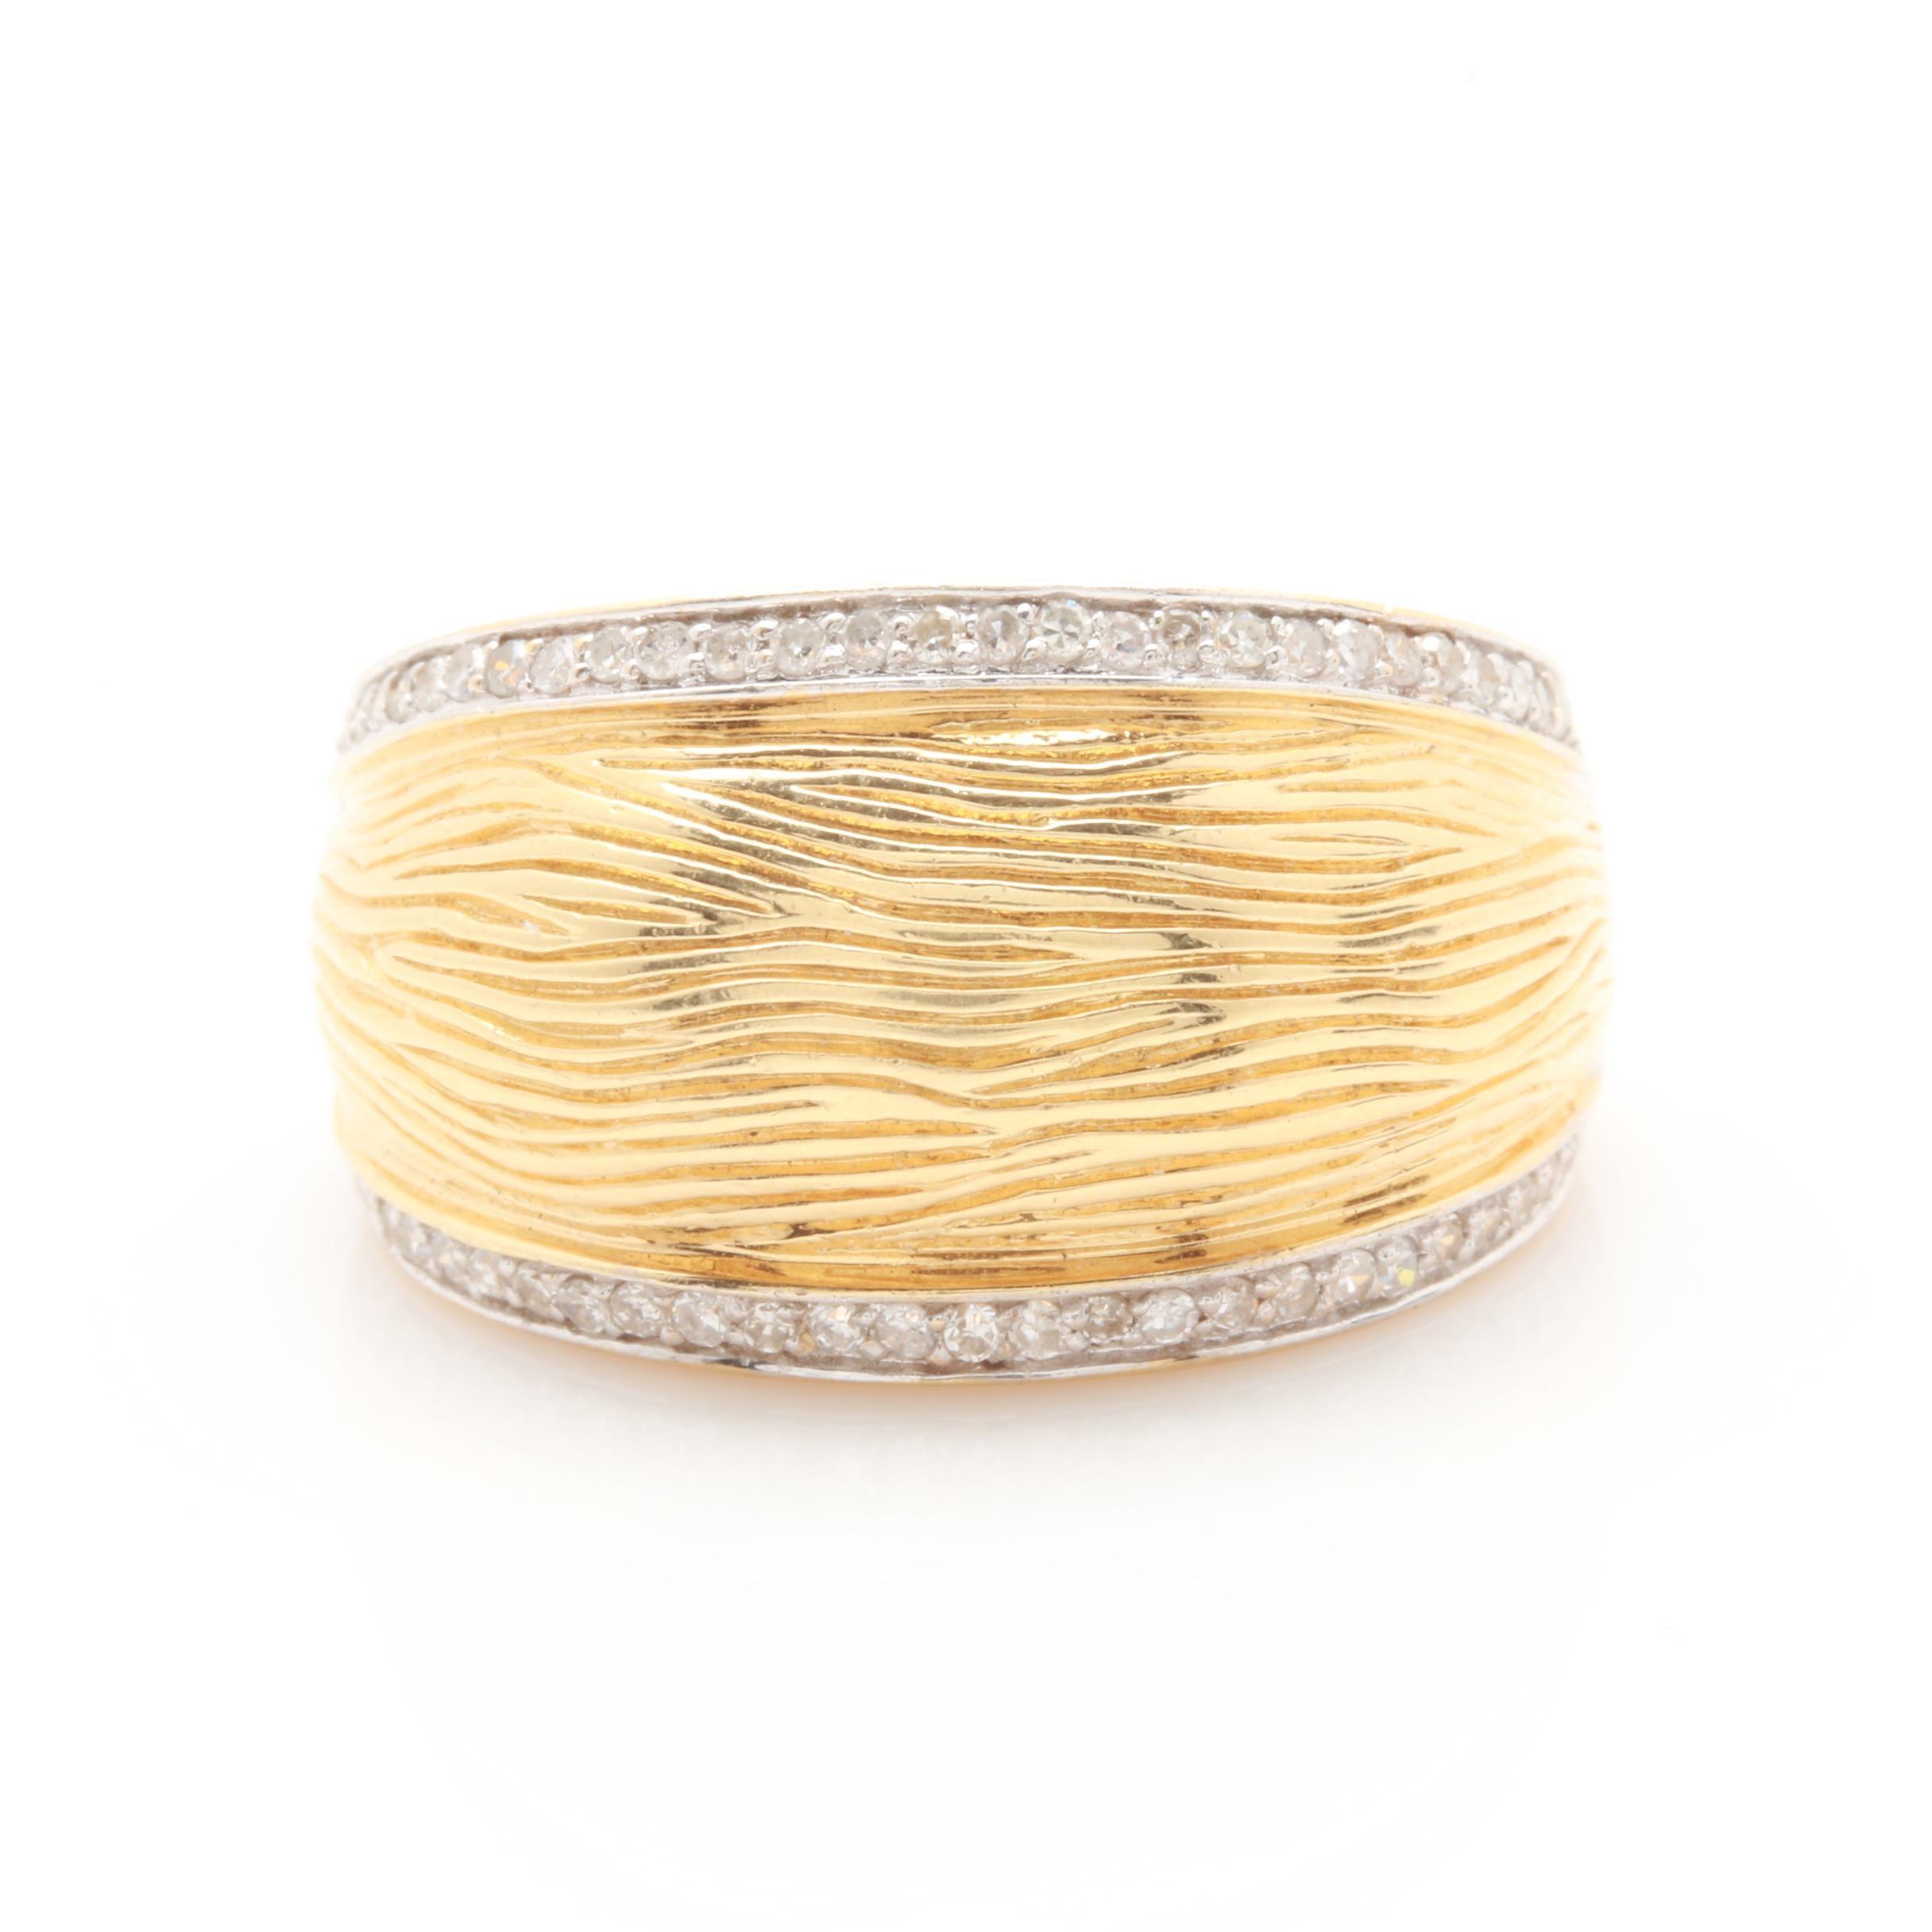 14K Yellow Gold Diamond Textured Dome Ring